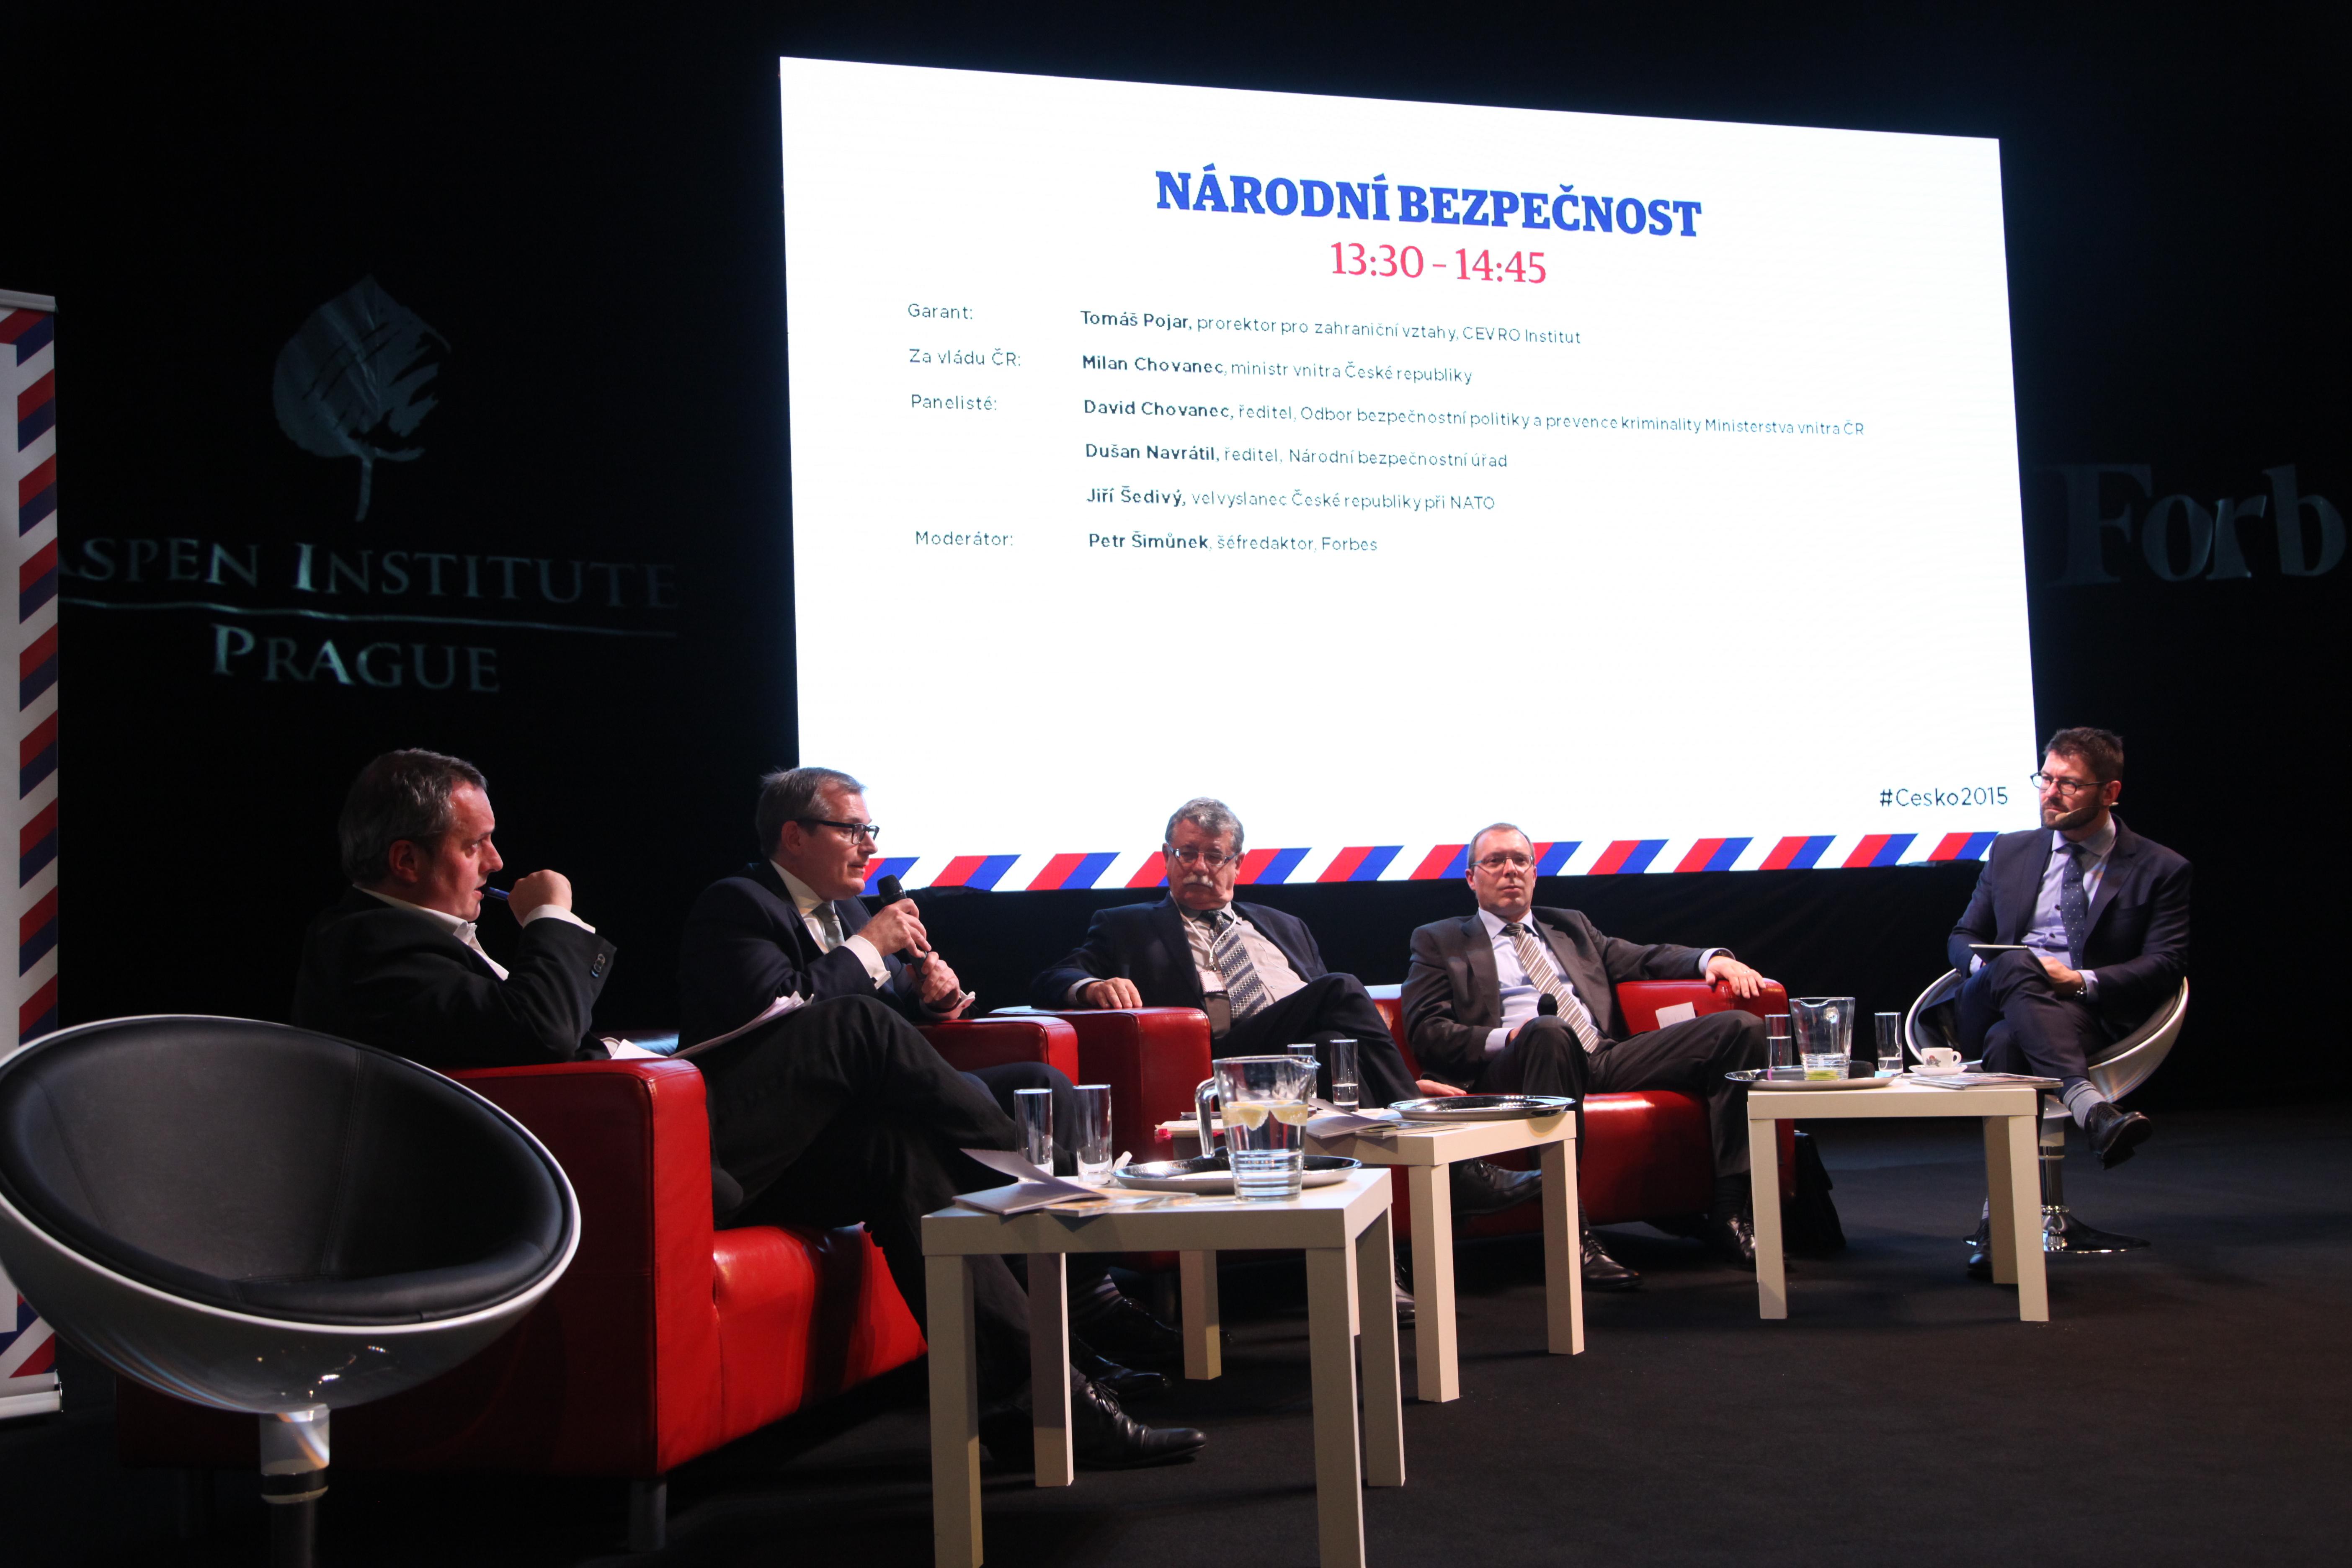 Aspen Institute Prague Annual Conference: Česko - Jak jsme na tom?